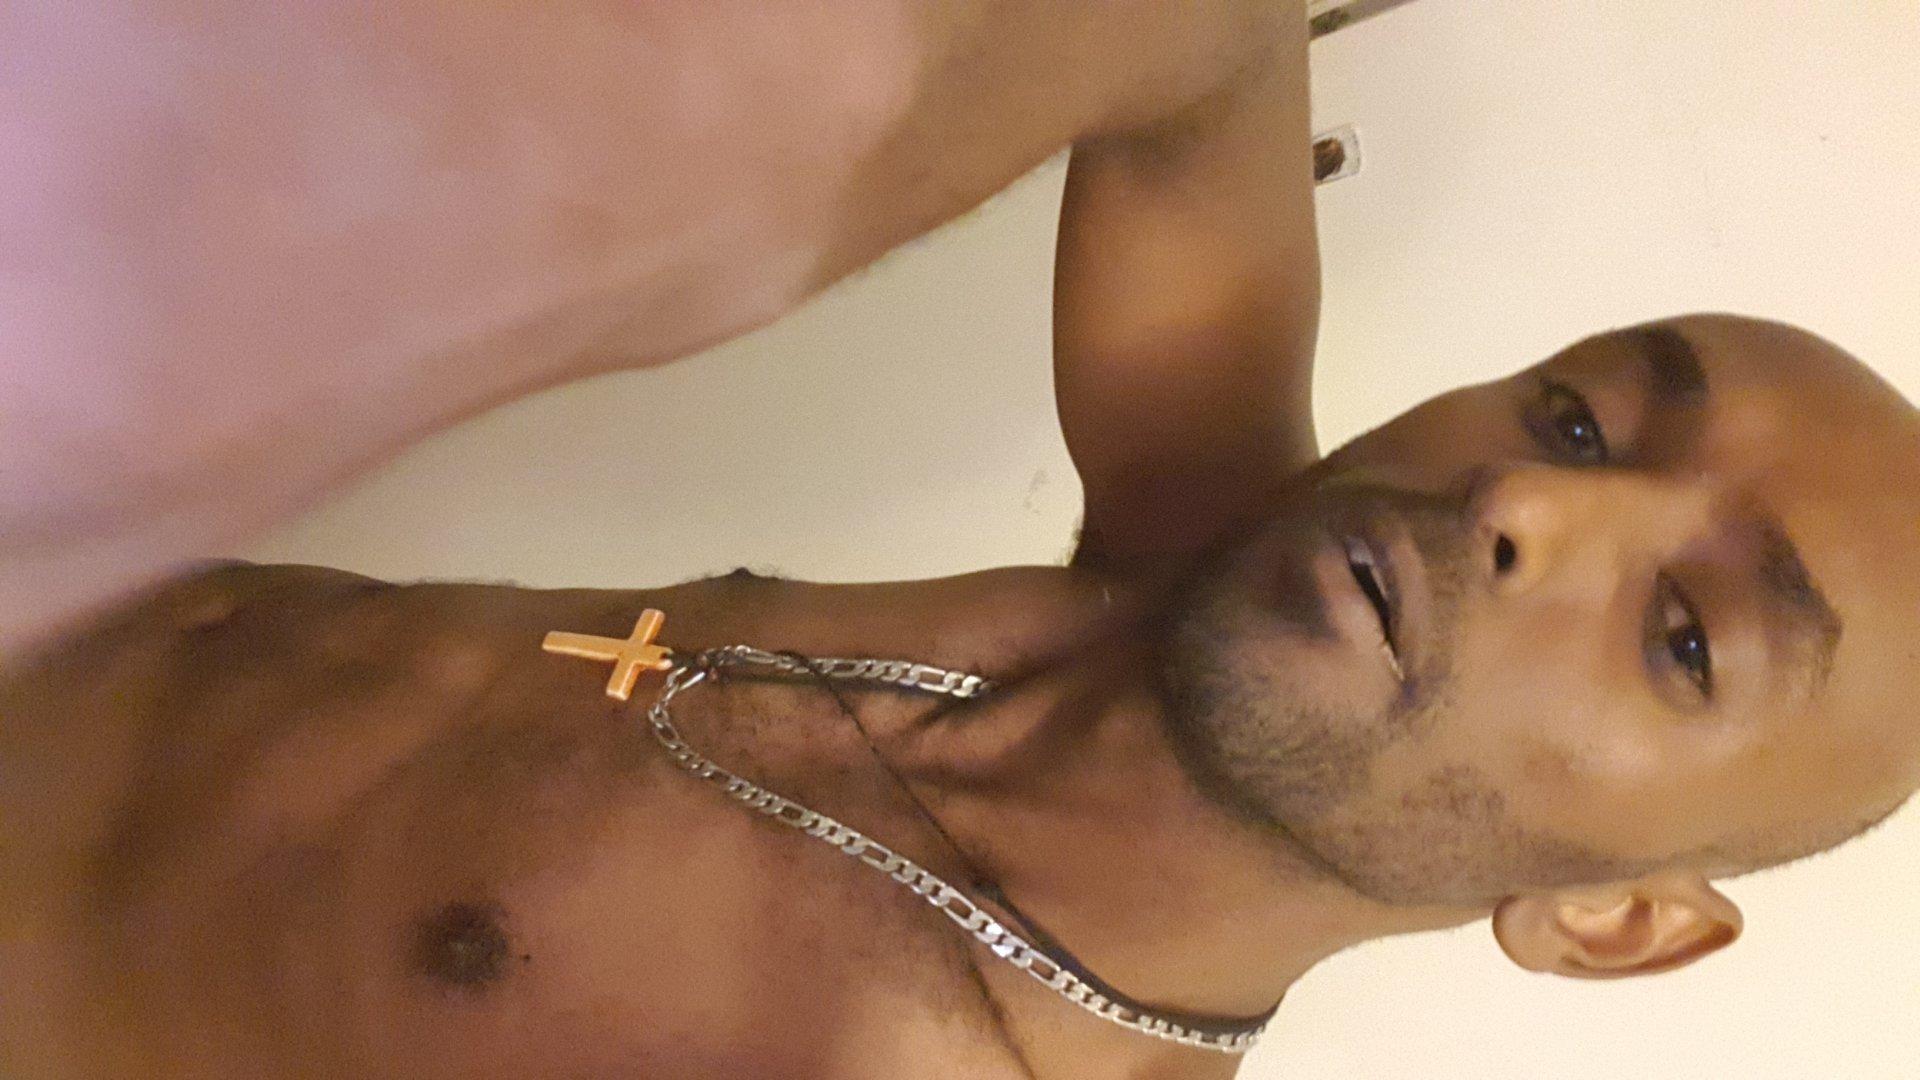 Taysir from South Australia,Australia